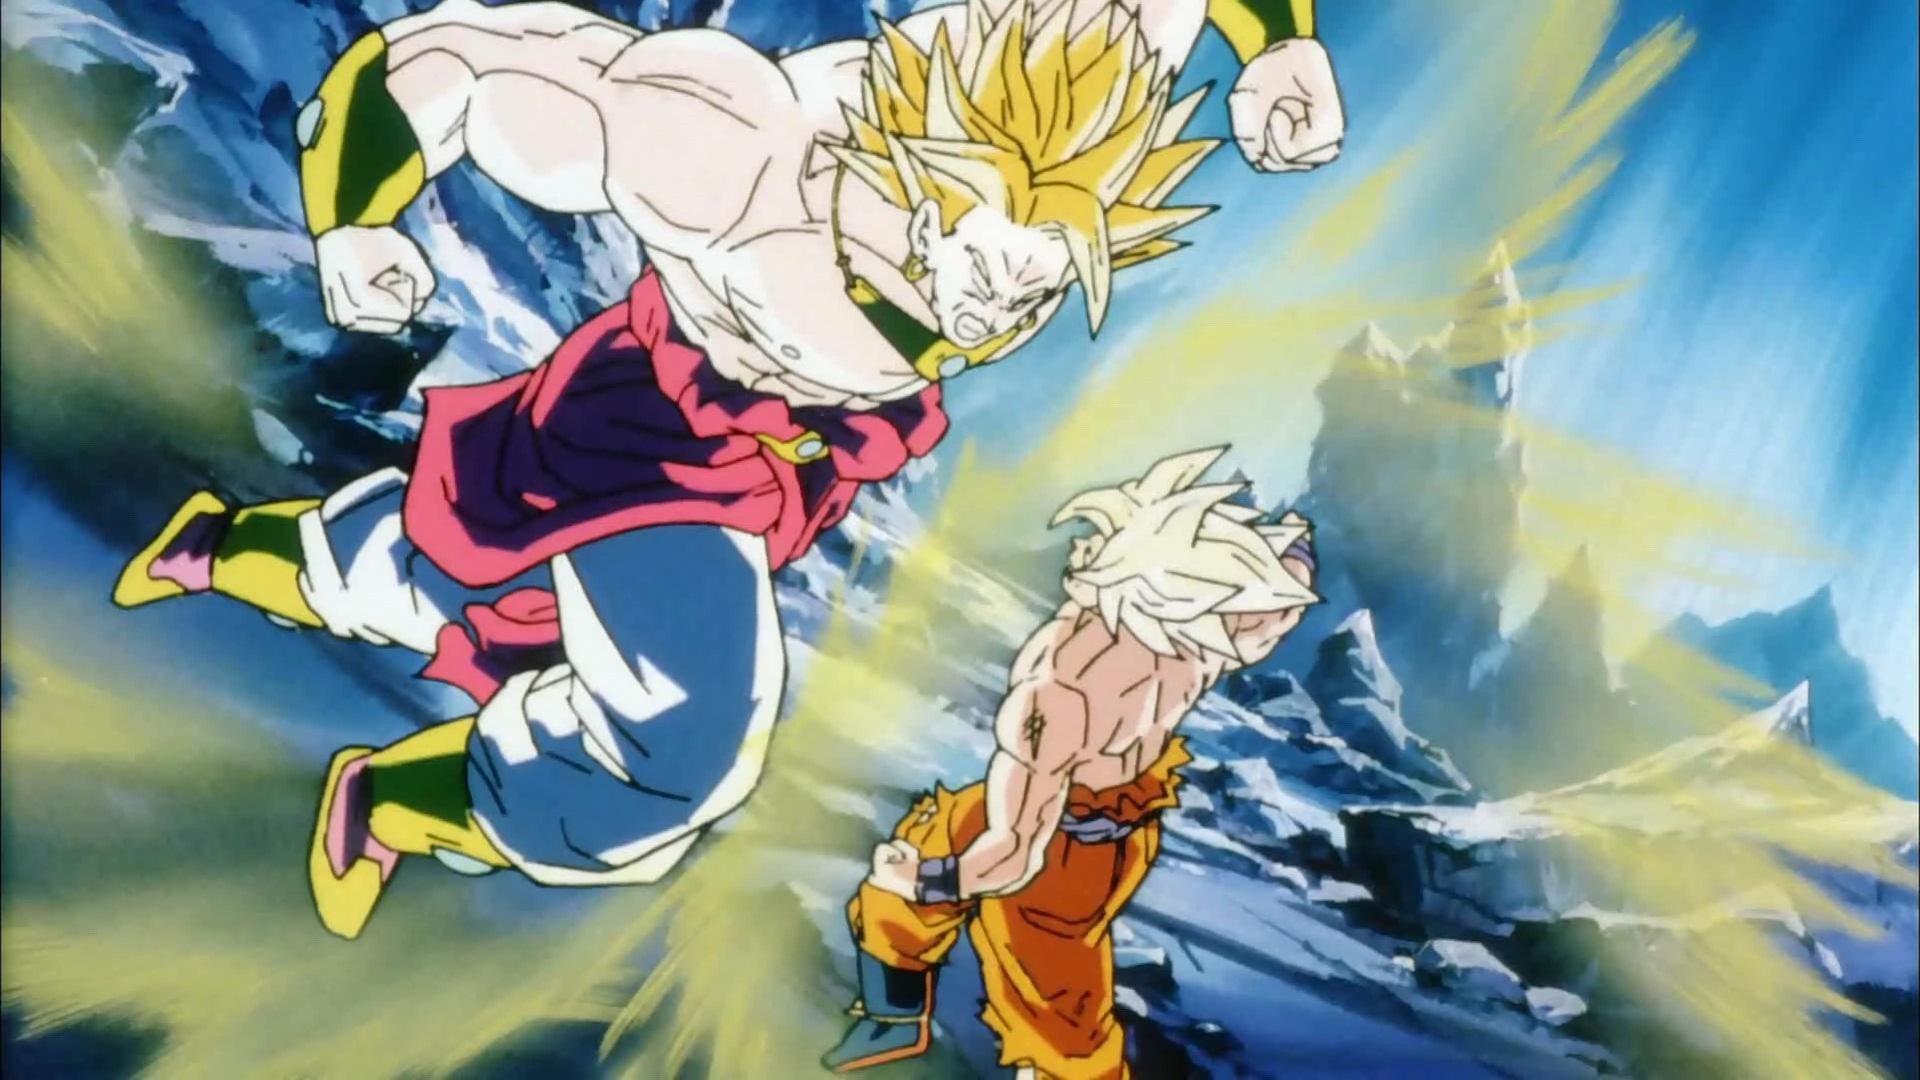 wallpaper.wiki-Goku-Dragon-Ball-Z-Image-Free-